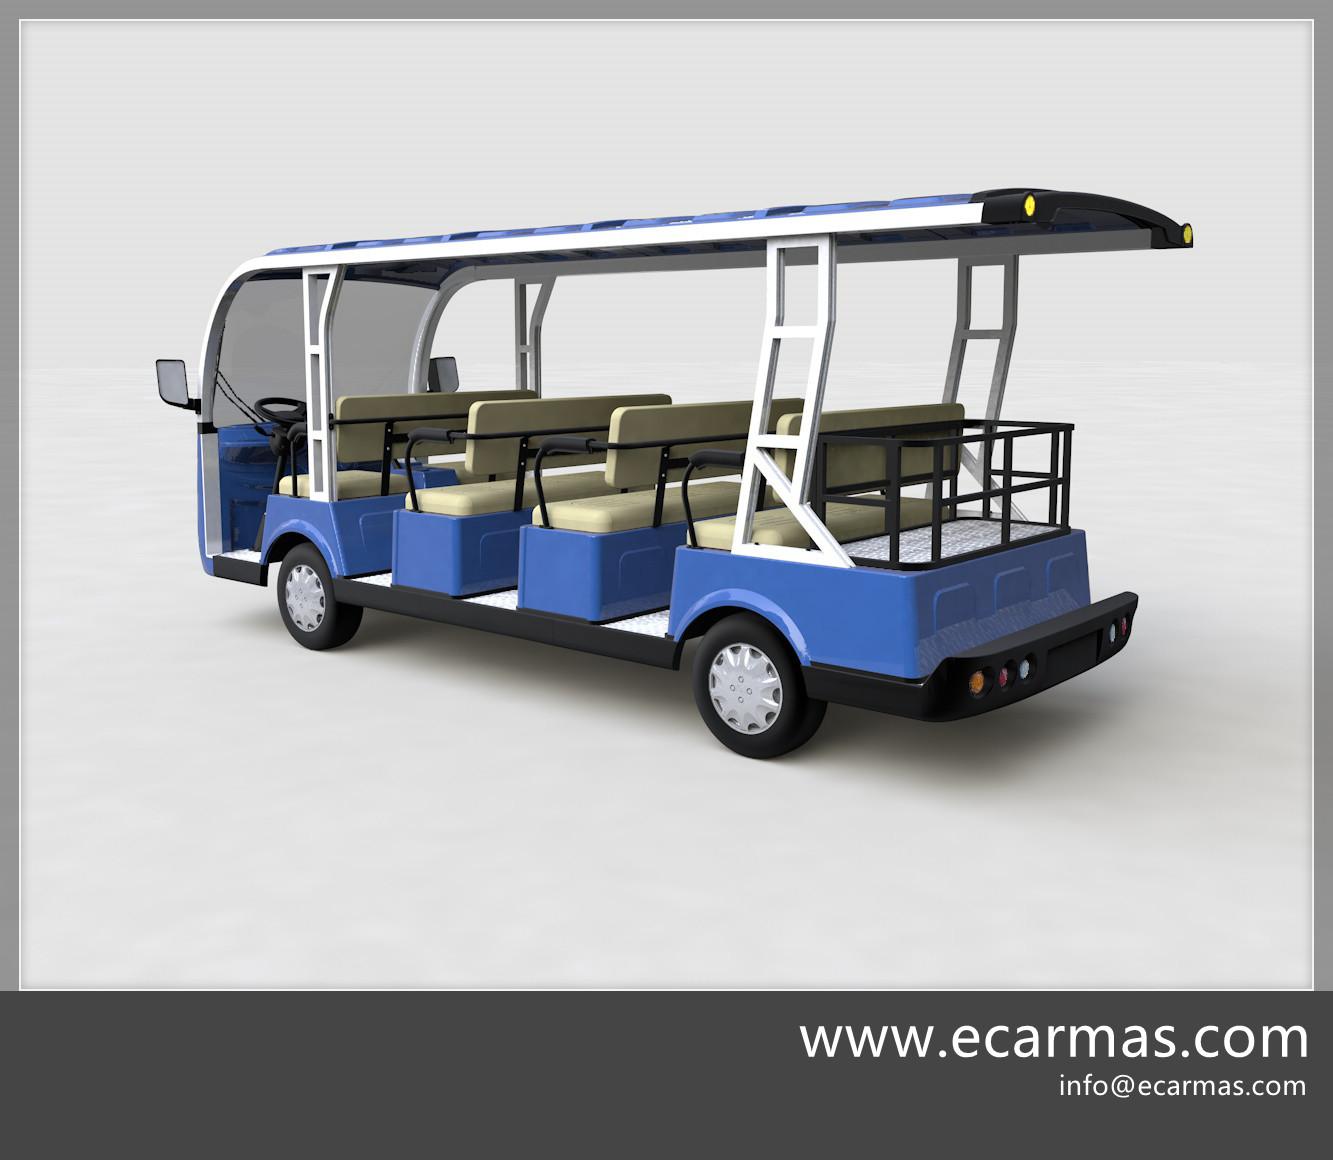 China Cheap Electric Leisure Vehicle